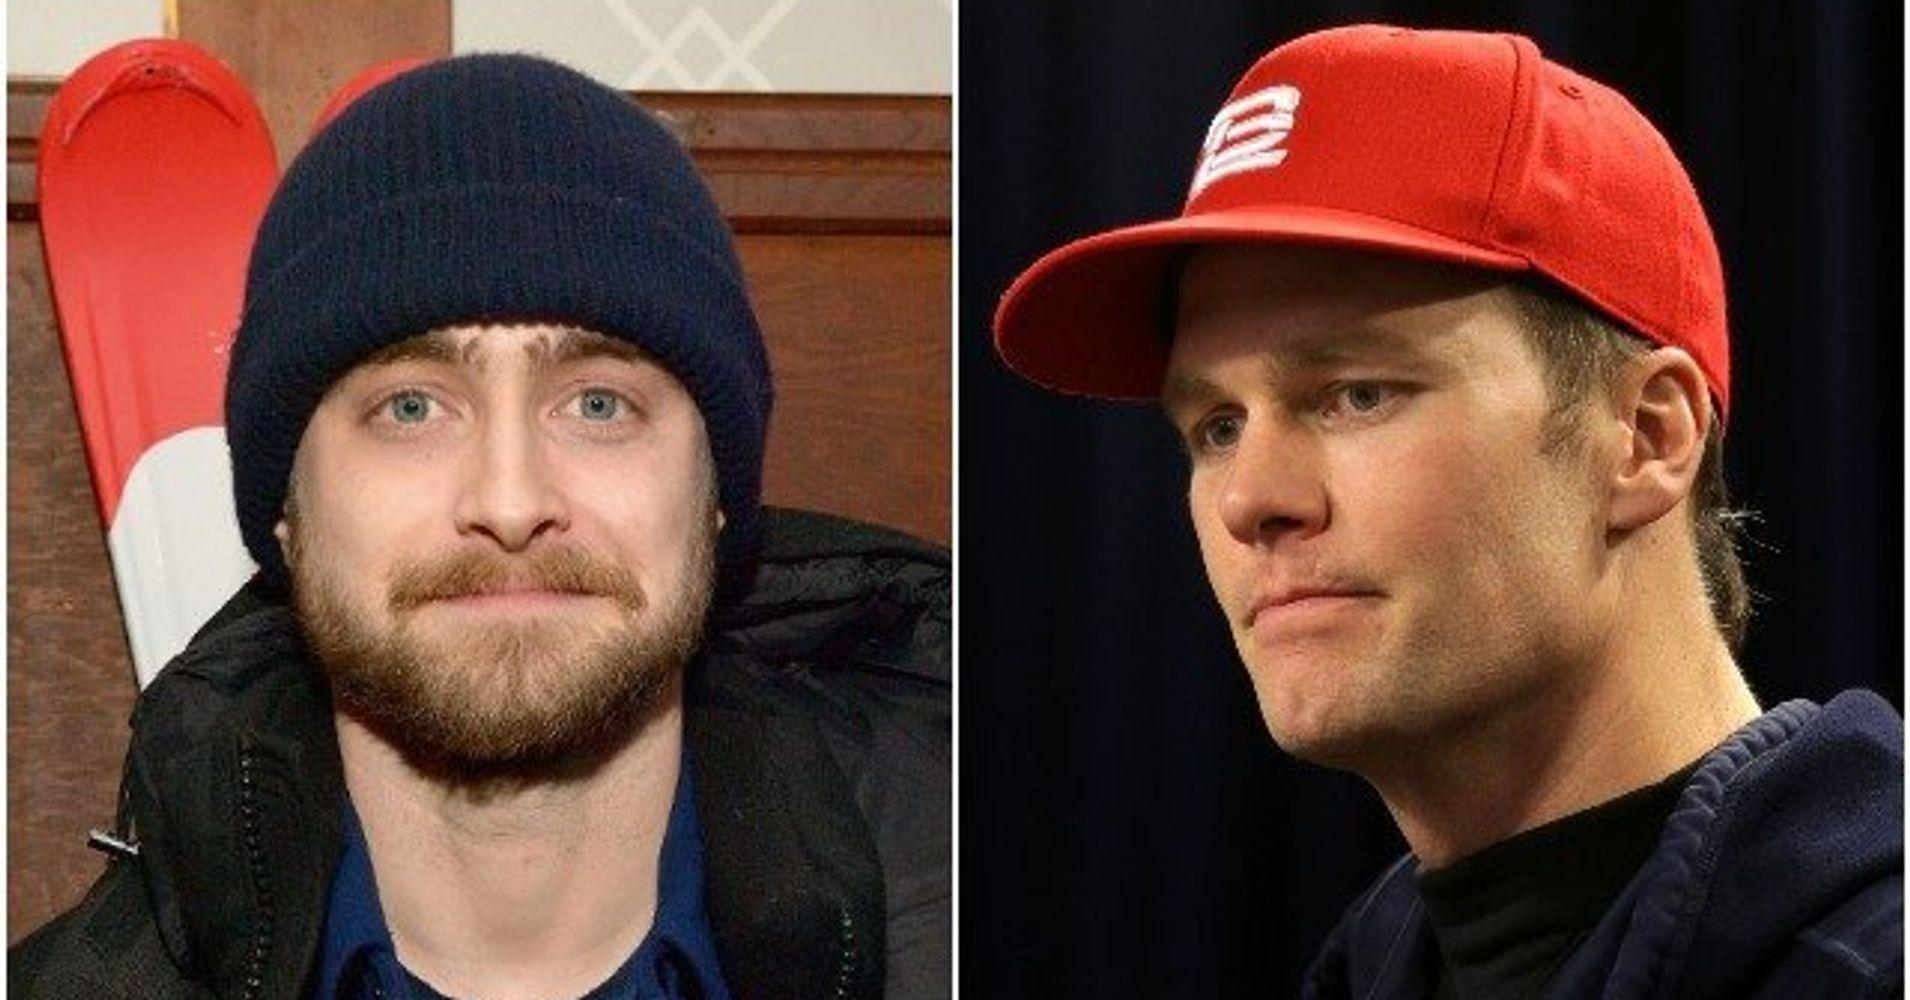 ba3caa731cf72 Daniel Radcliffe Rips Tom Brady s MAGA Hat